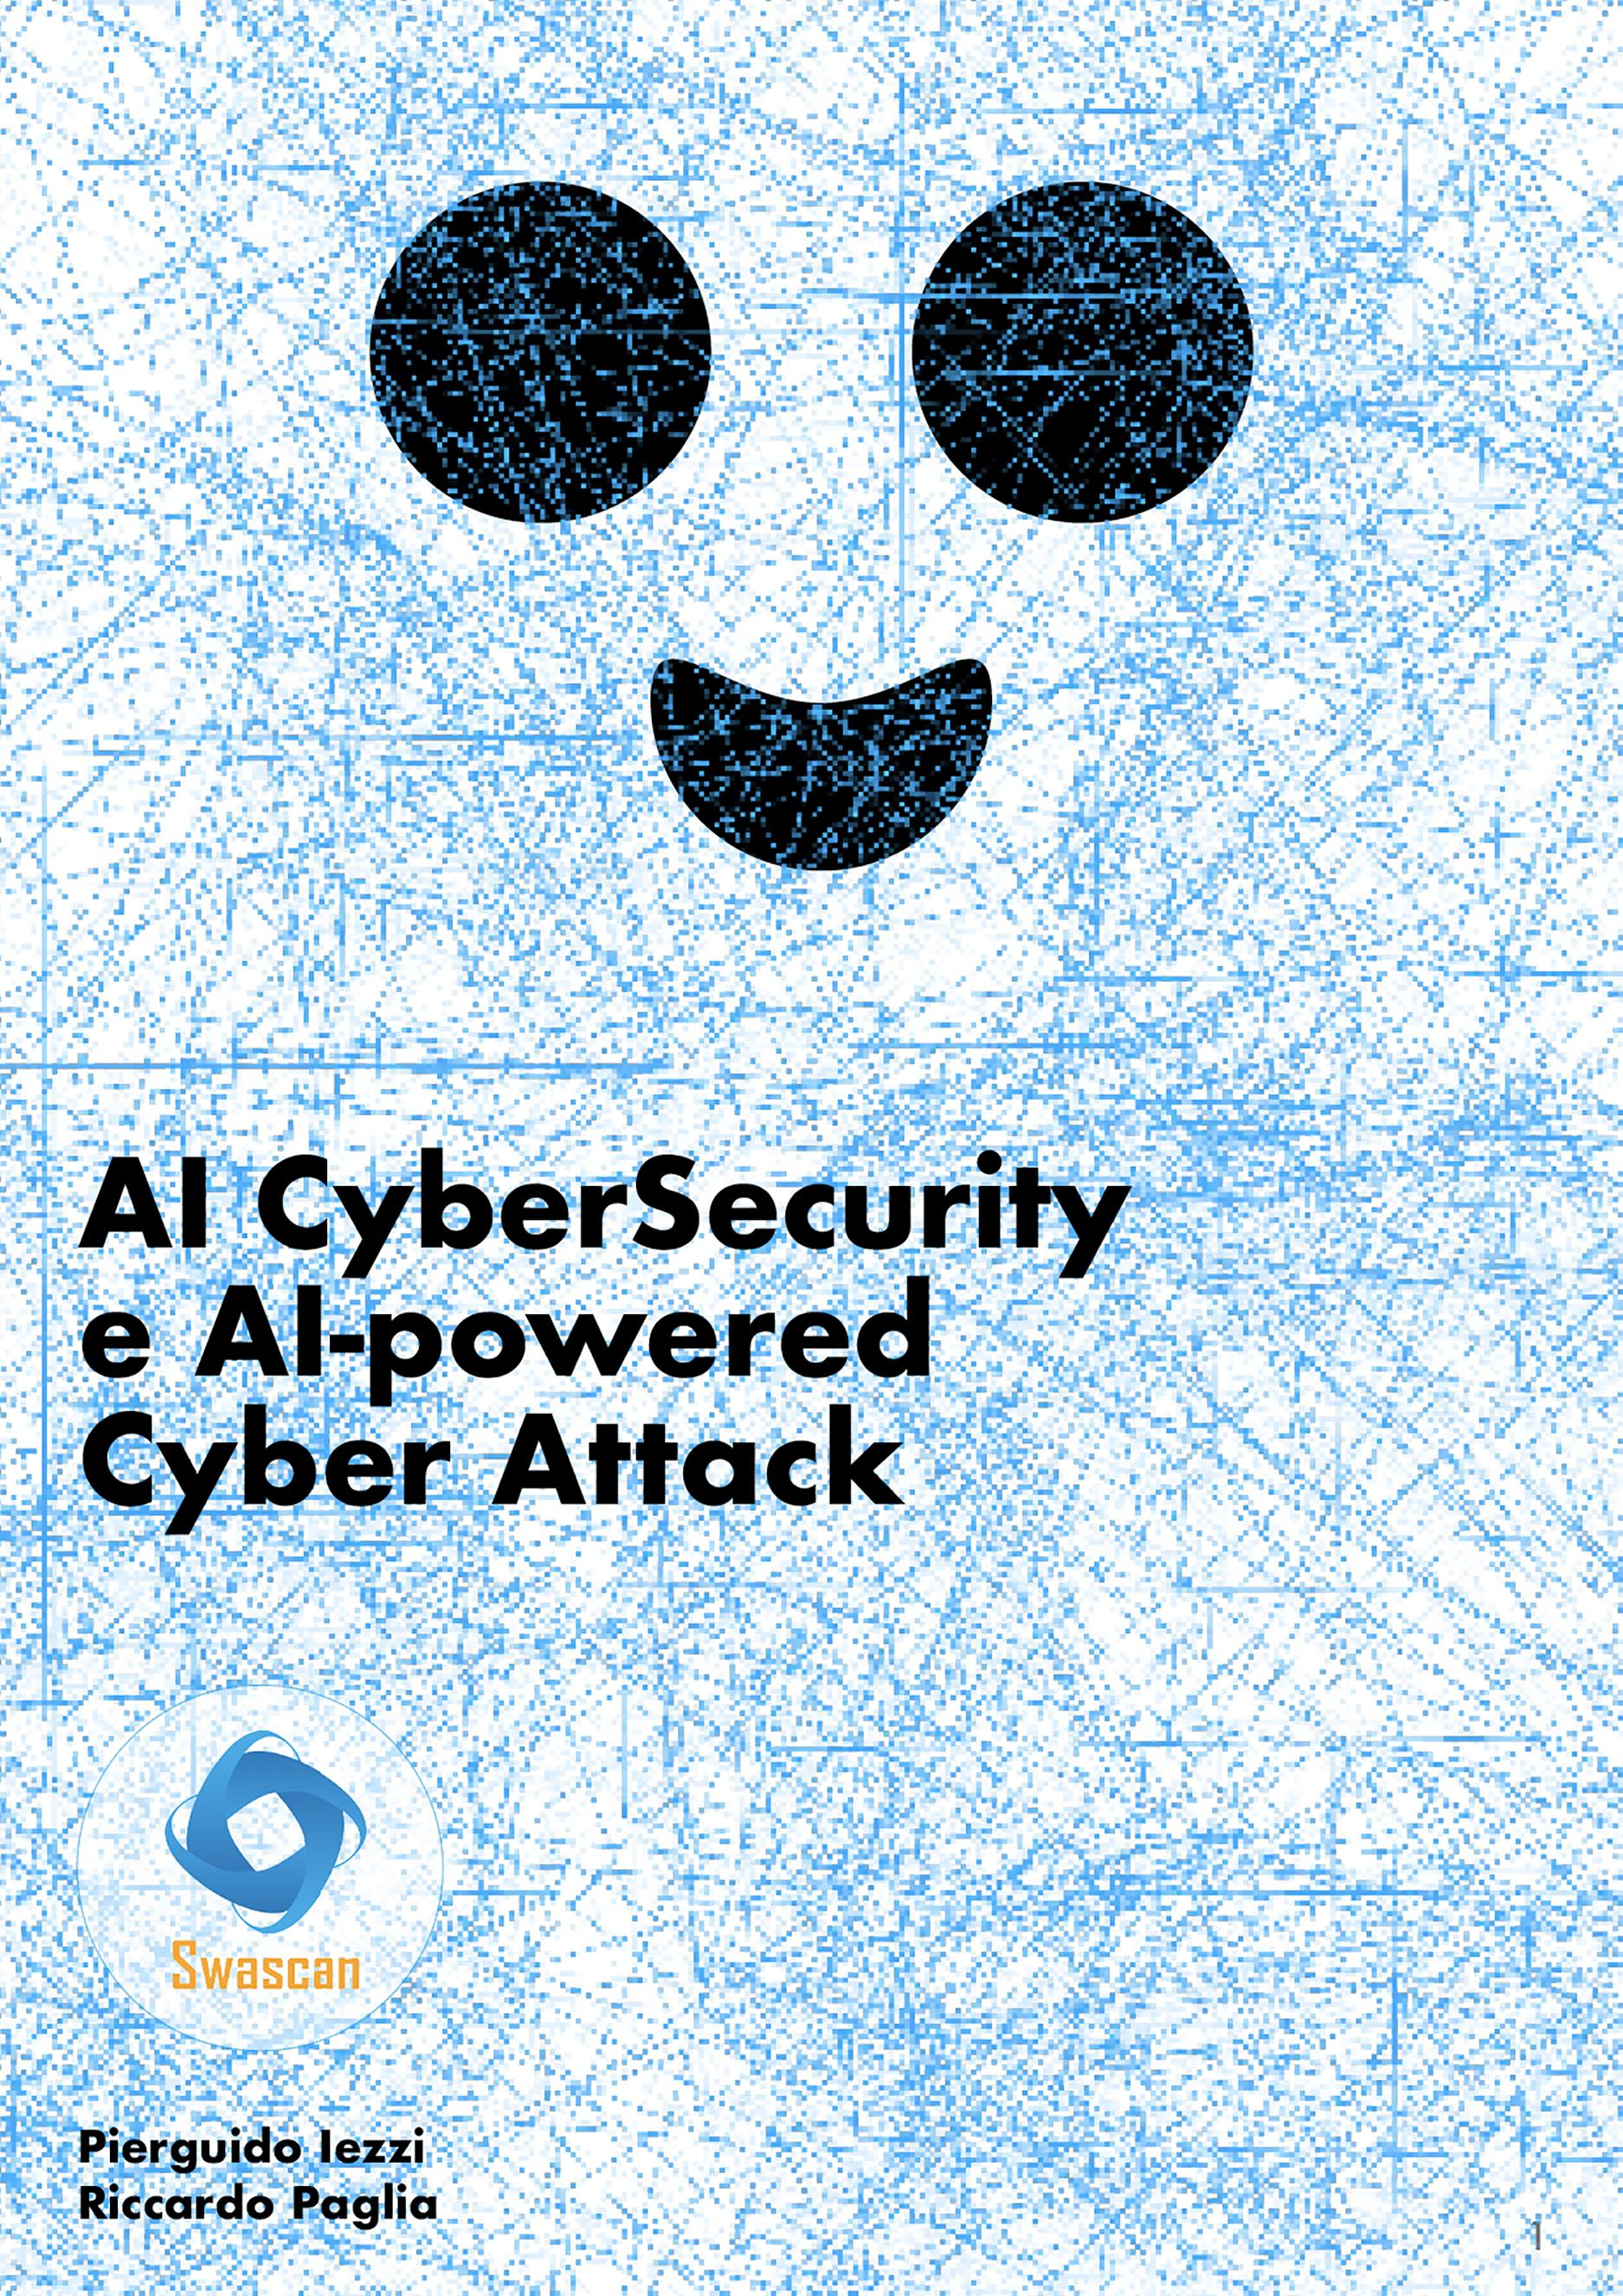 AI CyberSecurity e AI-powered Cyber Attack